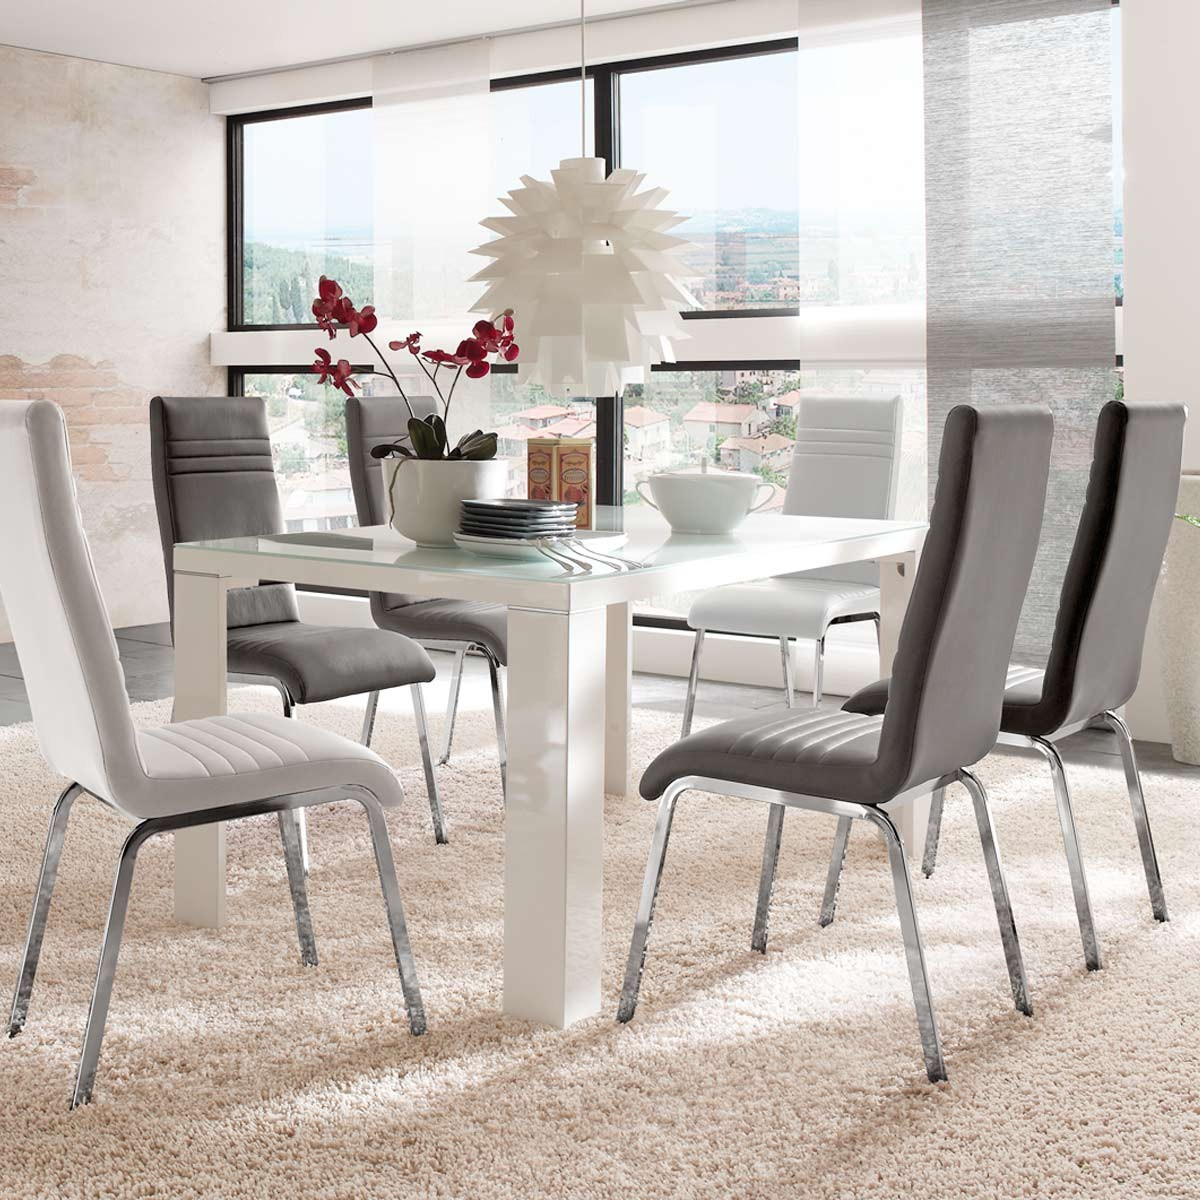 st hle esszimmer modern hausgestaltung ideen. Black Bedroom Furniture Sets. Home Design Ideas